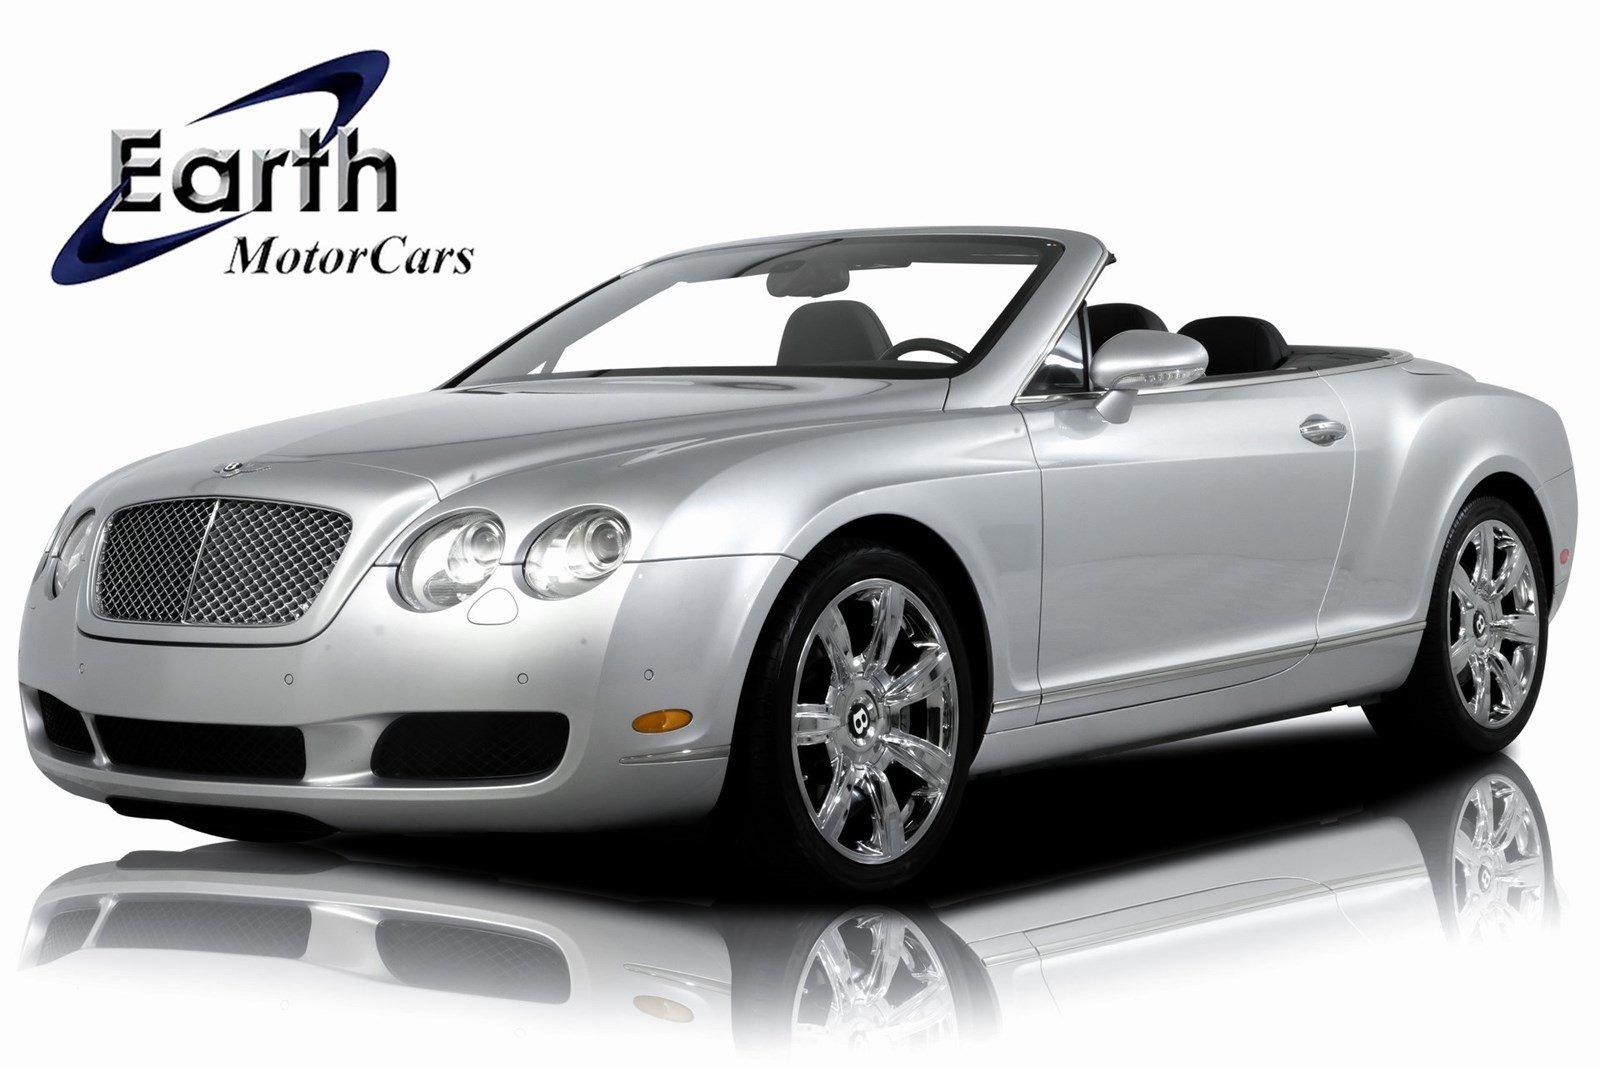 2007 Bentley Continental GTC Convertible image